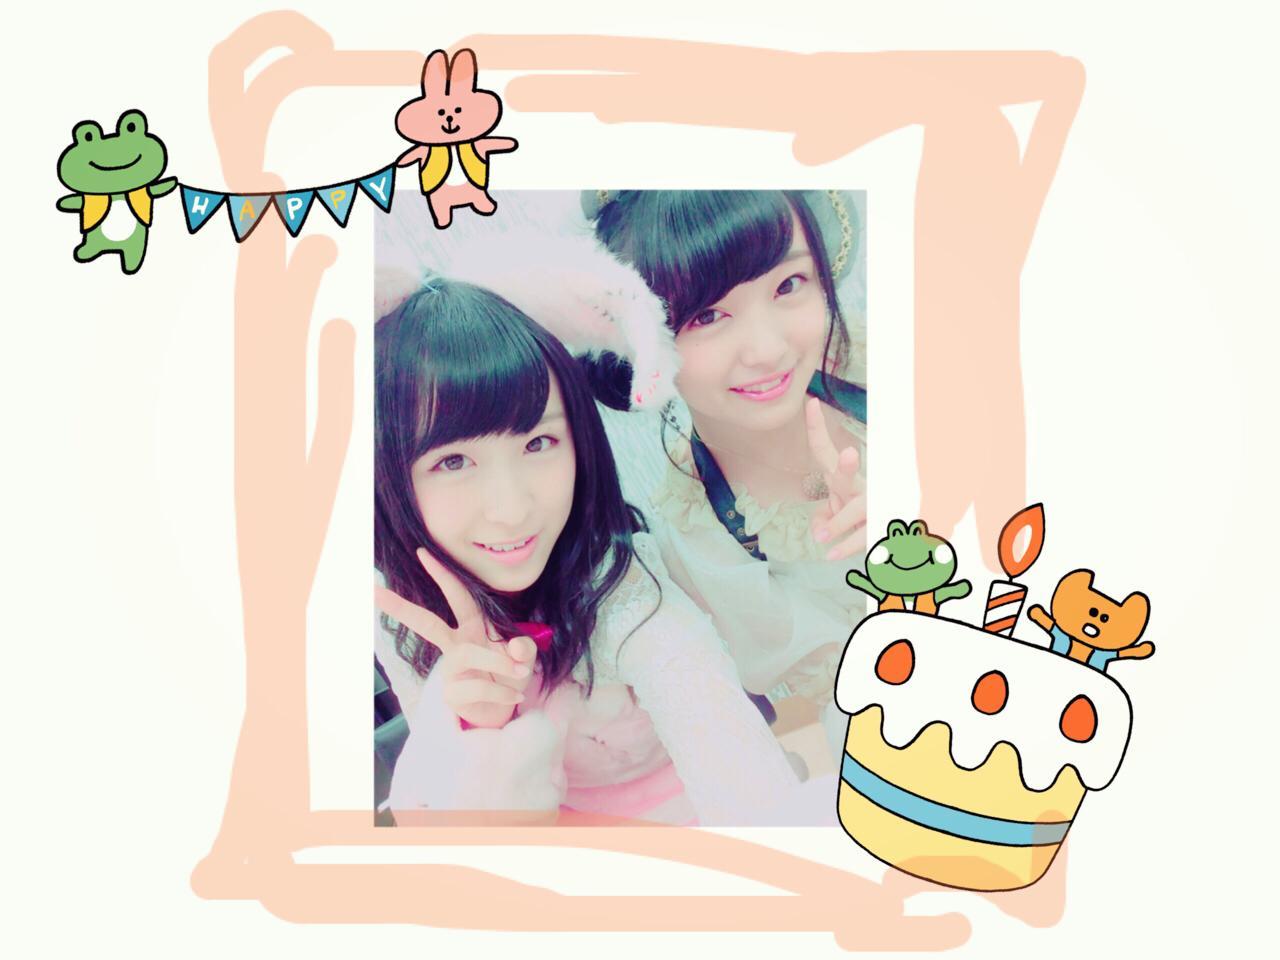 【AKB48】川本紗矢応援スレ★32【さやや】 YouTube動画>65本 ->画像>1285枚